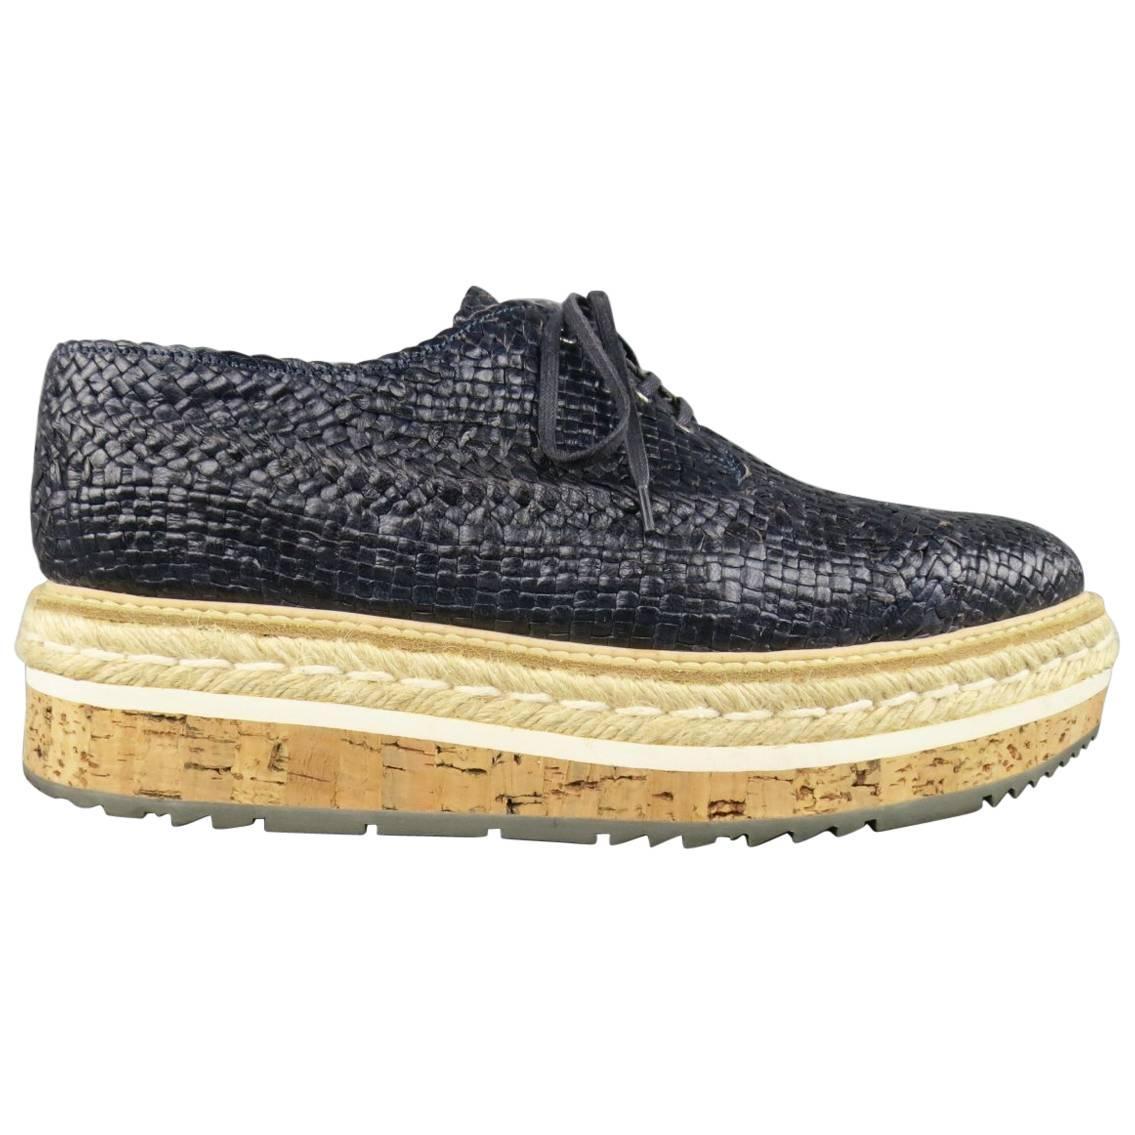 Prada Navy Woven Leather Cork Platform Dress Shoes